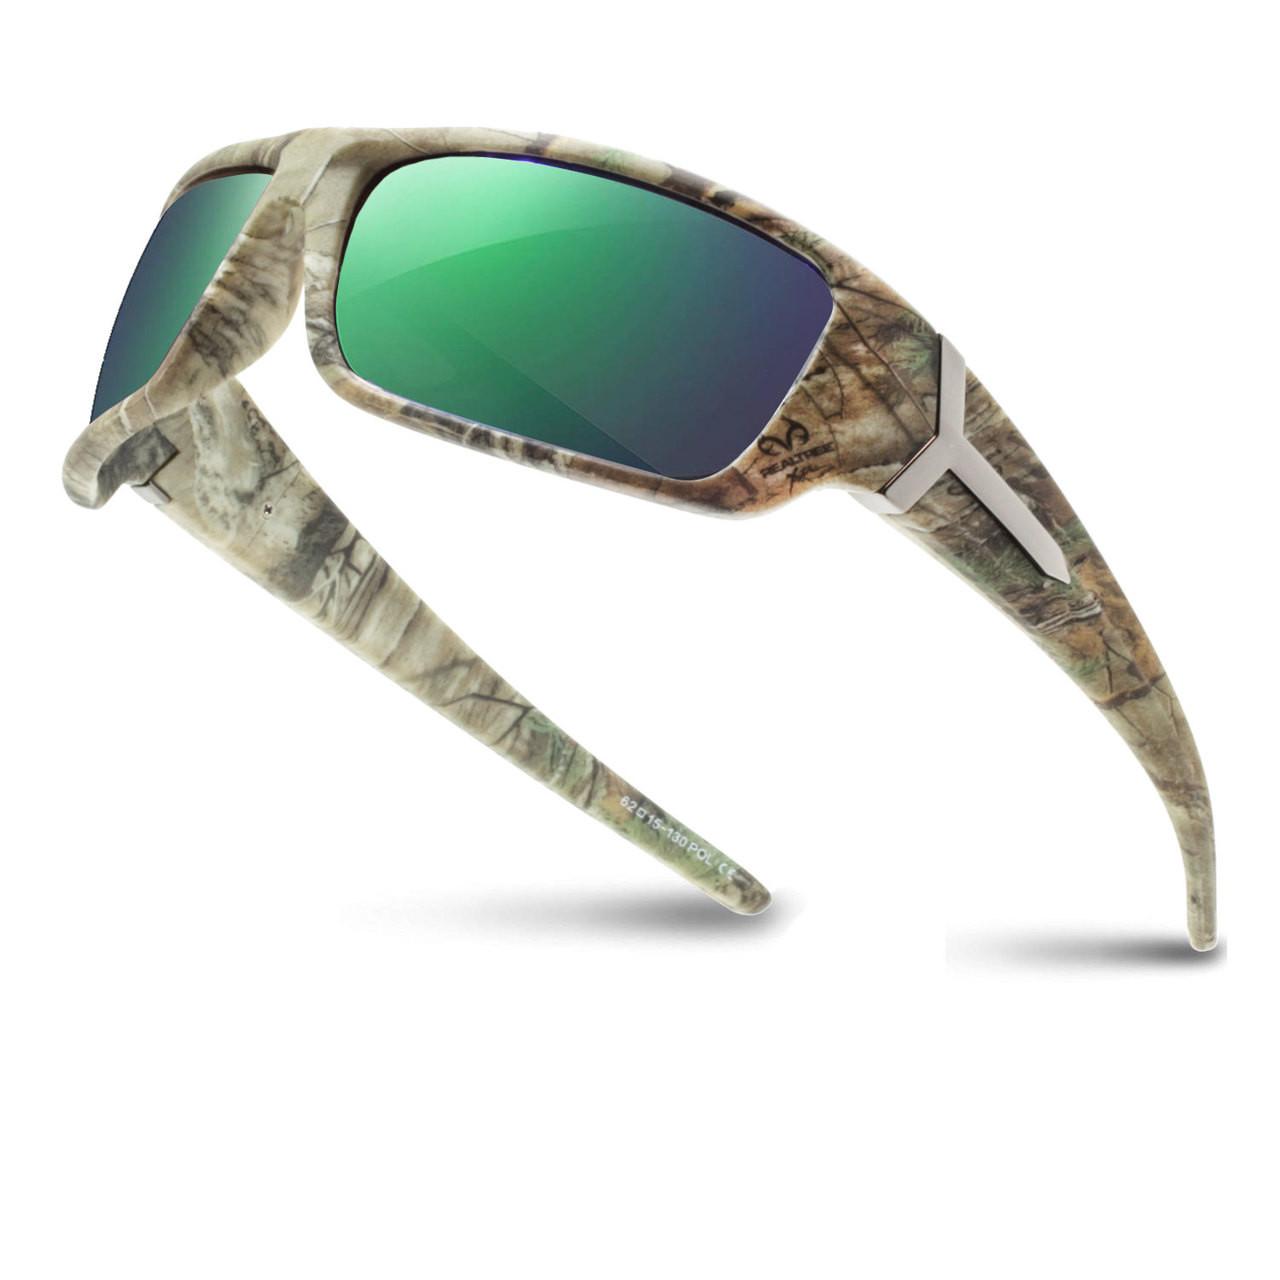 0cb5e4b29ce8 Wholesale Assorted Color RealTree Camo Pattern Plastic Polarized UV400  Sport Wrap Sunglasses Mens Bulk | 1 Dozen with Tags | RXS03RTPOL. Racer X